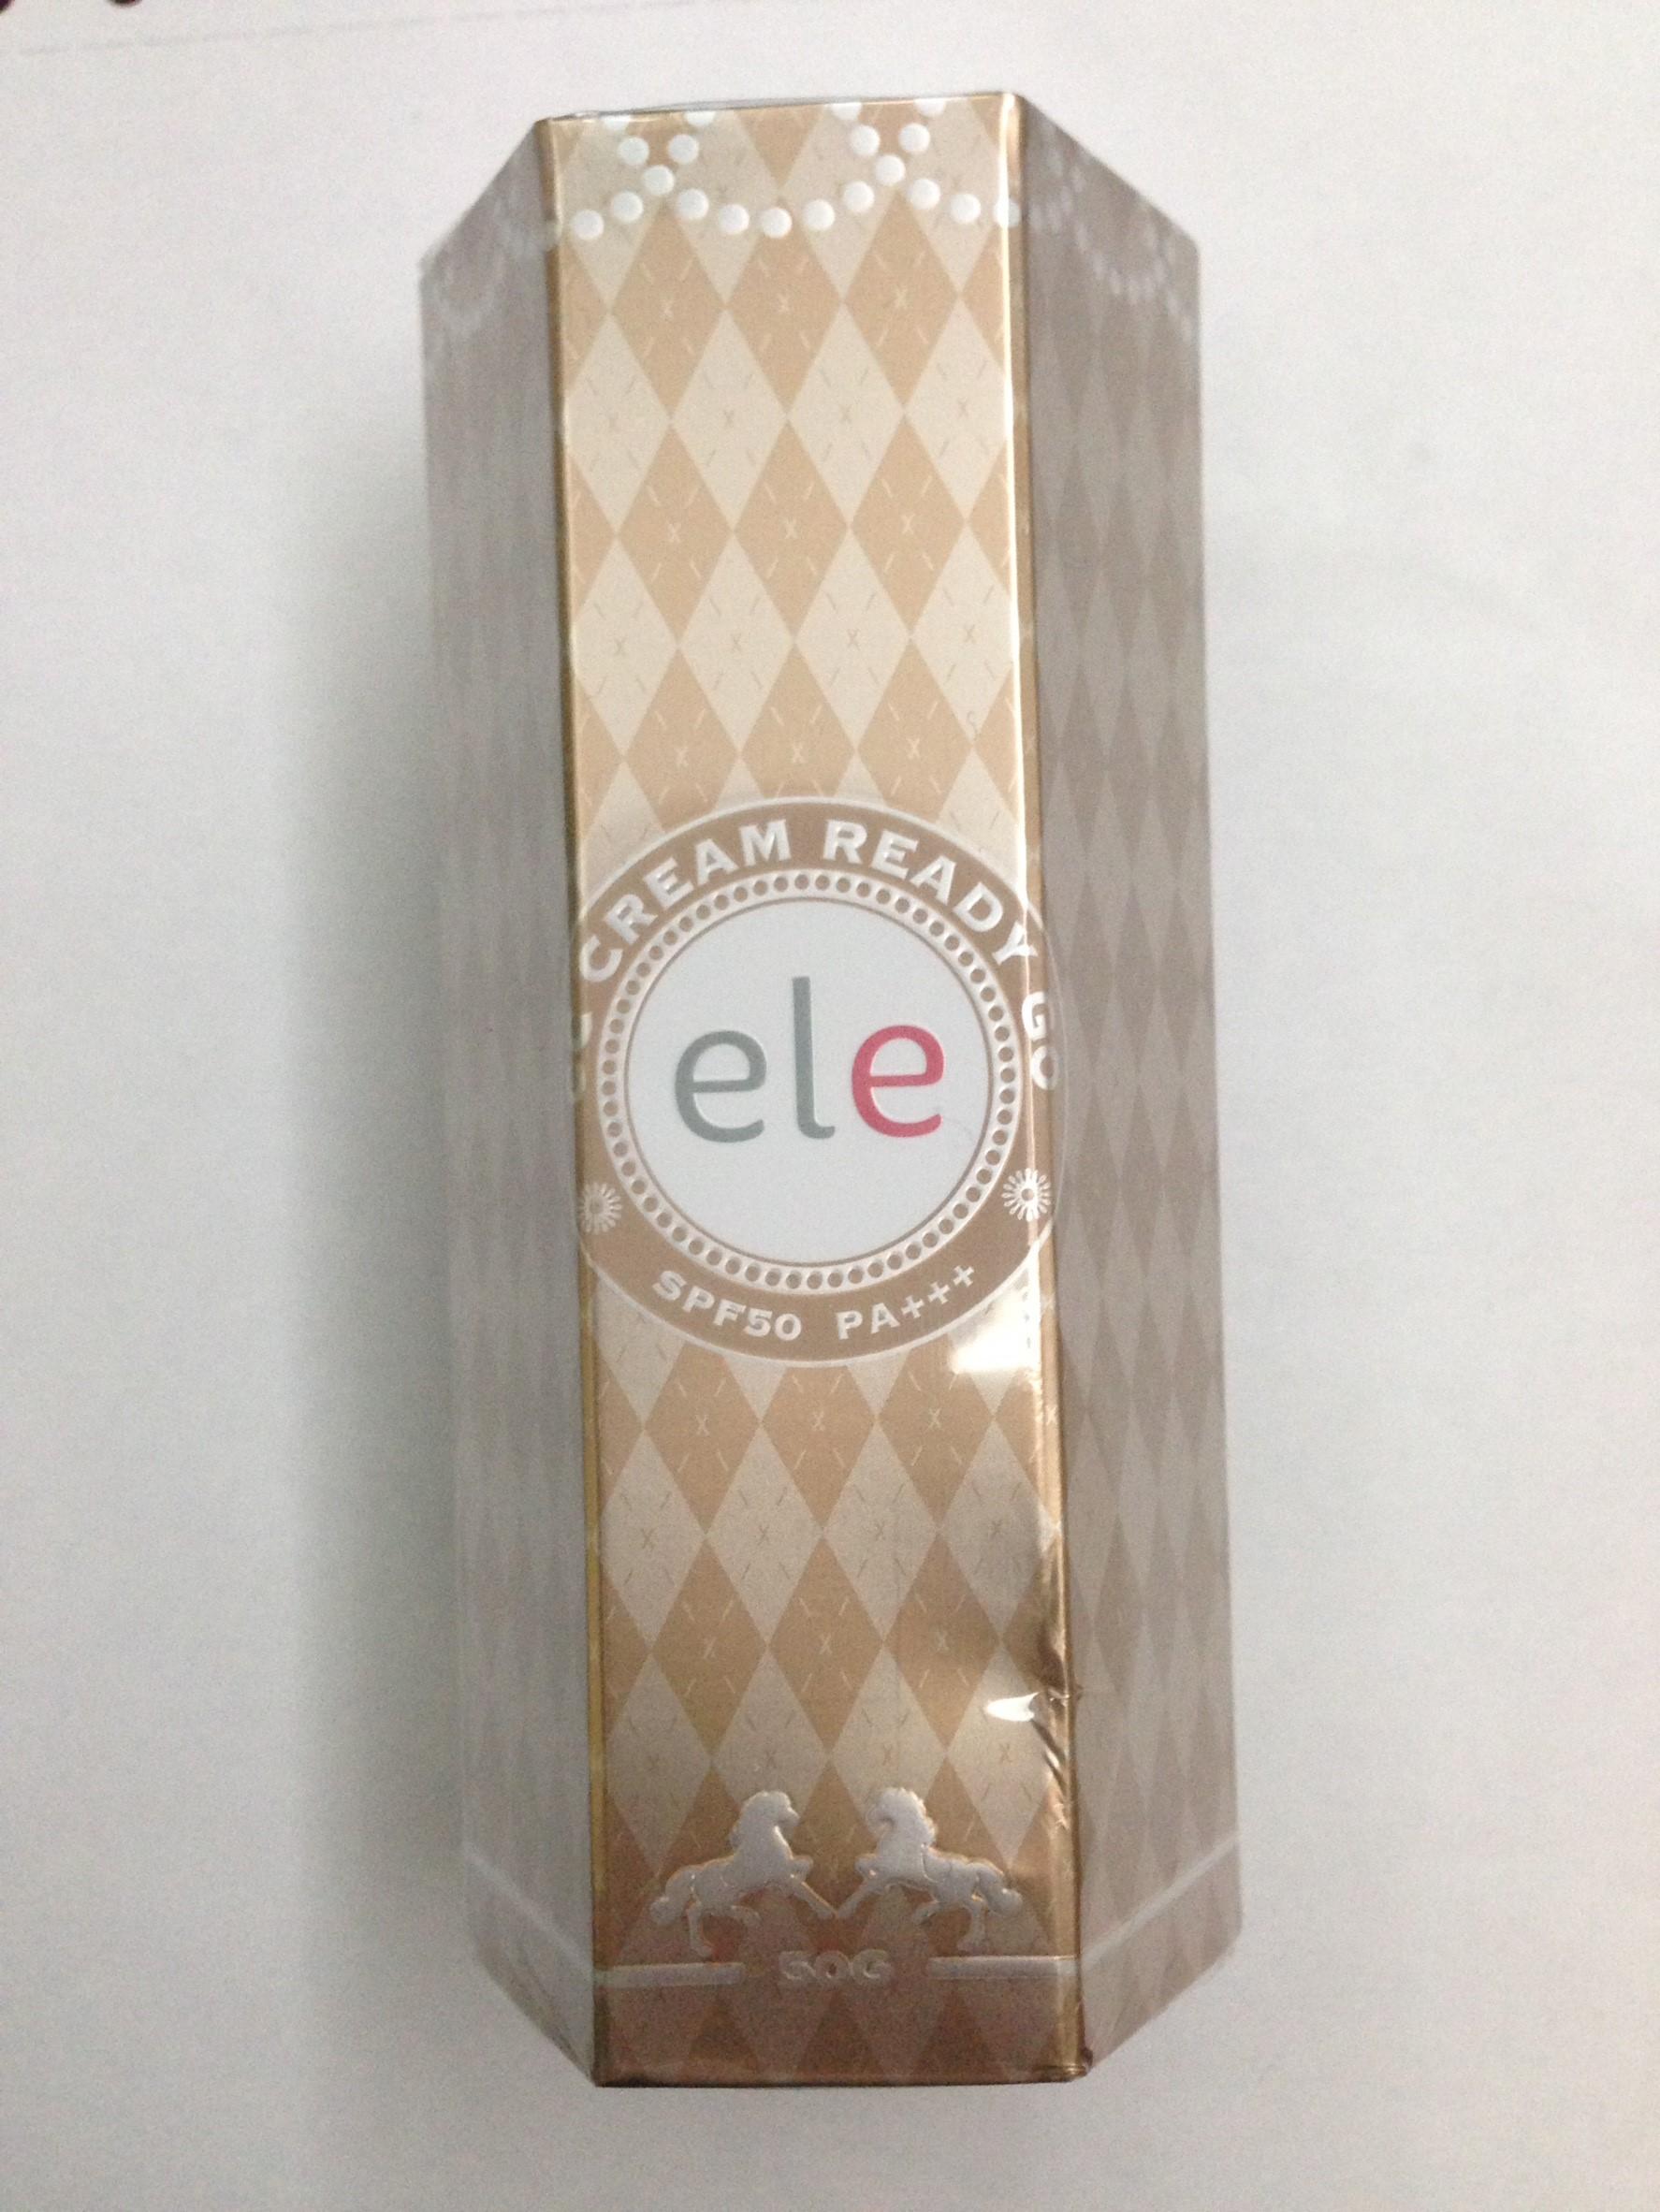 Ele Cream ซีซีครีม SPF50PA+++ รองพื้น ควบคุมมัน กันแดด